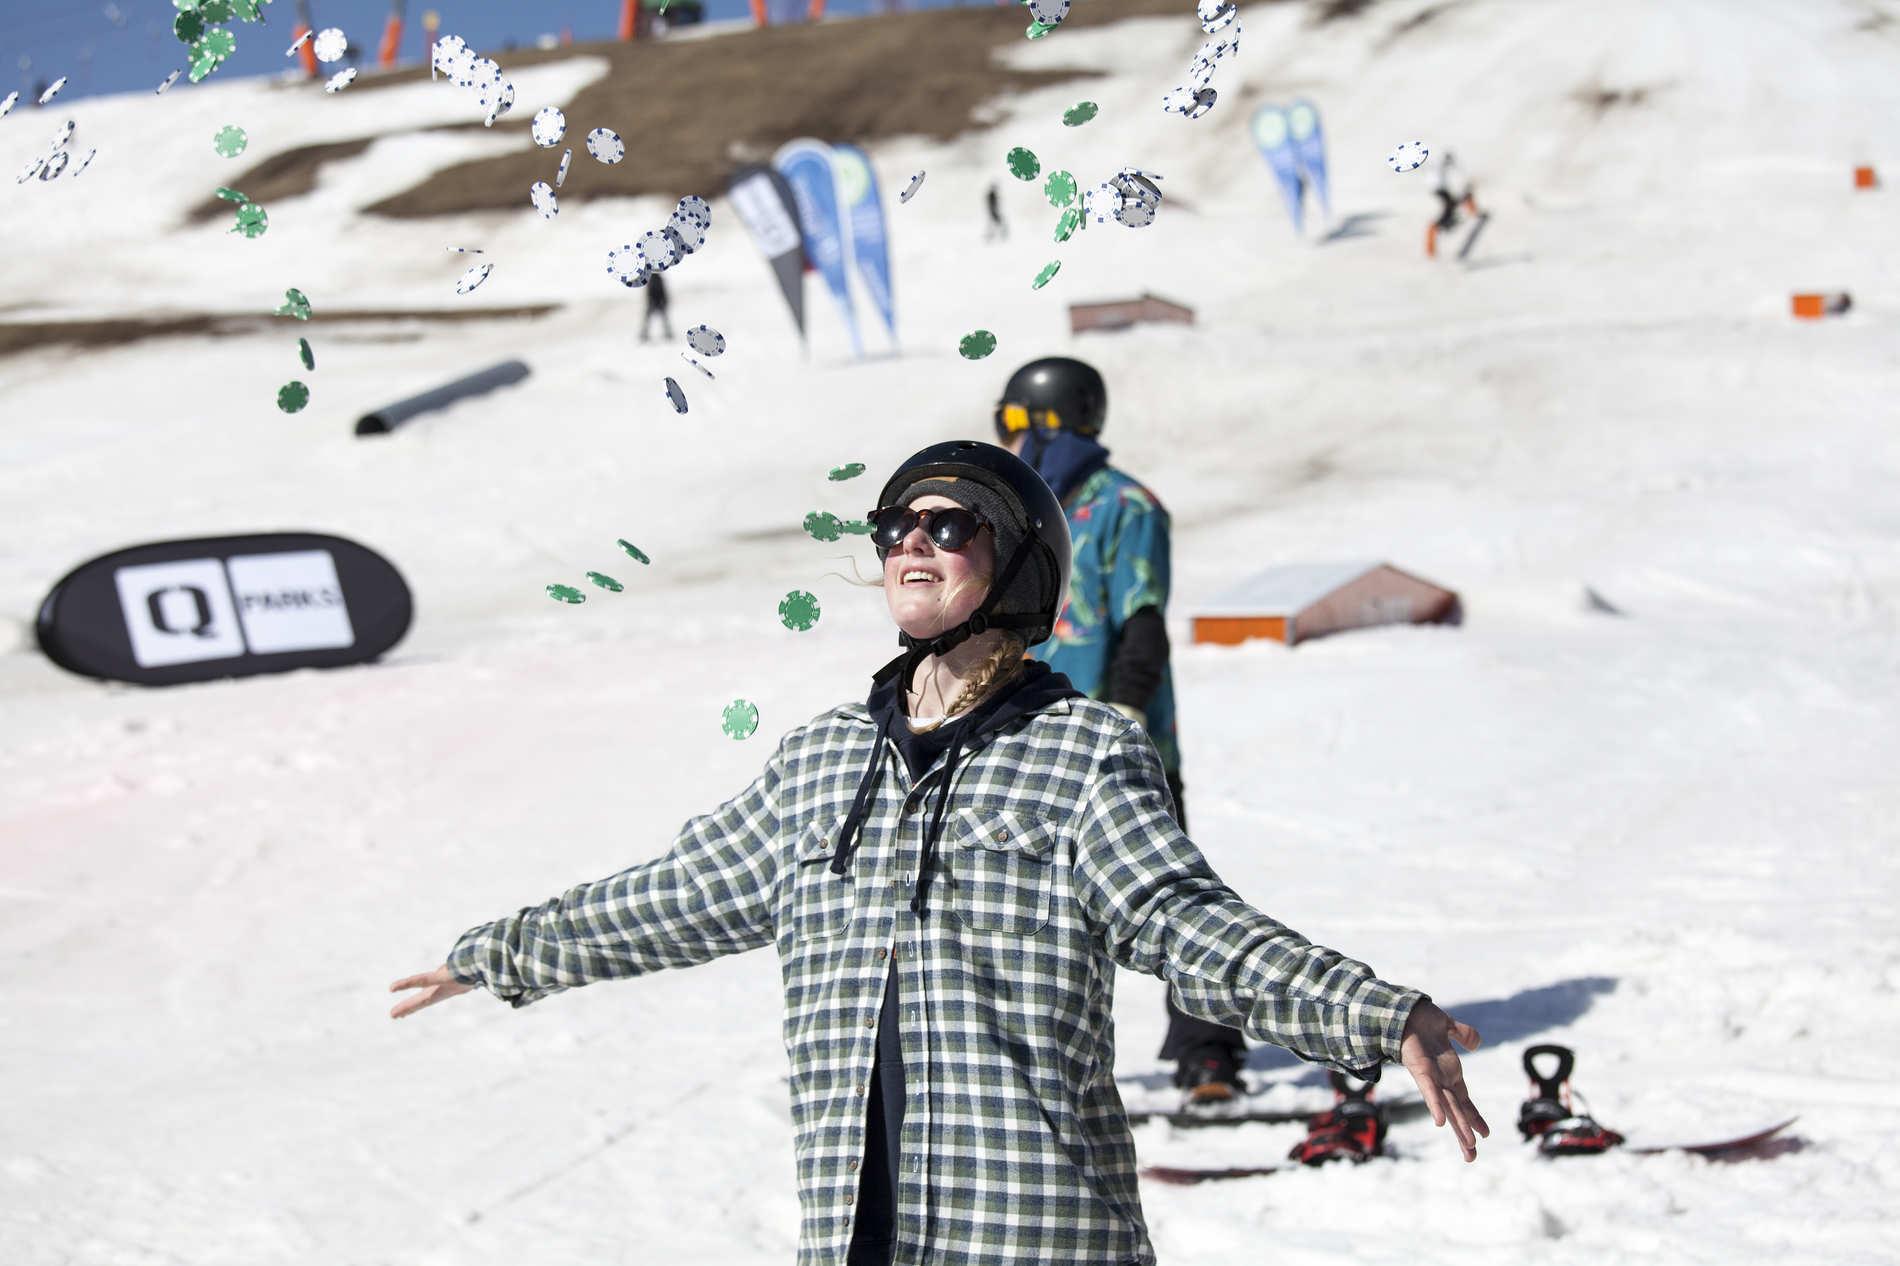 web snowpark feldberg 25 03 2017 lifestyle fs sb martin herrmann qparks 10